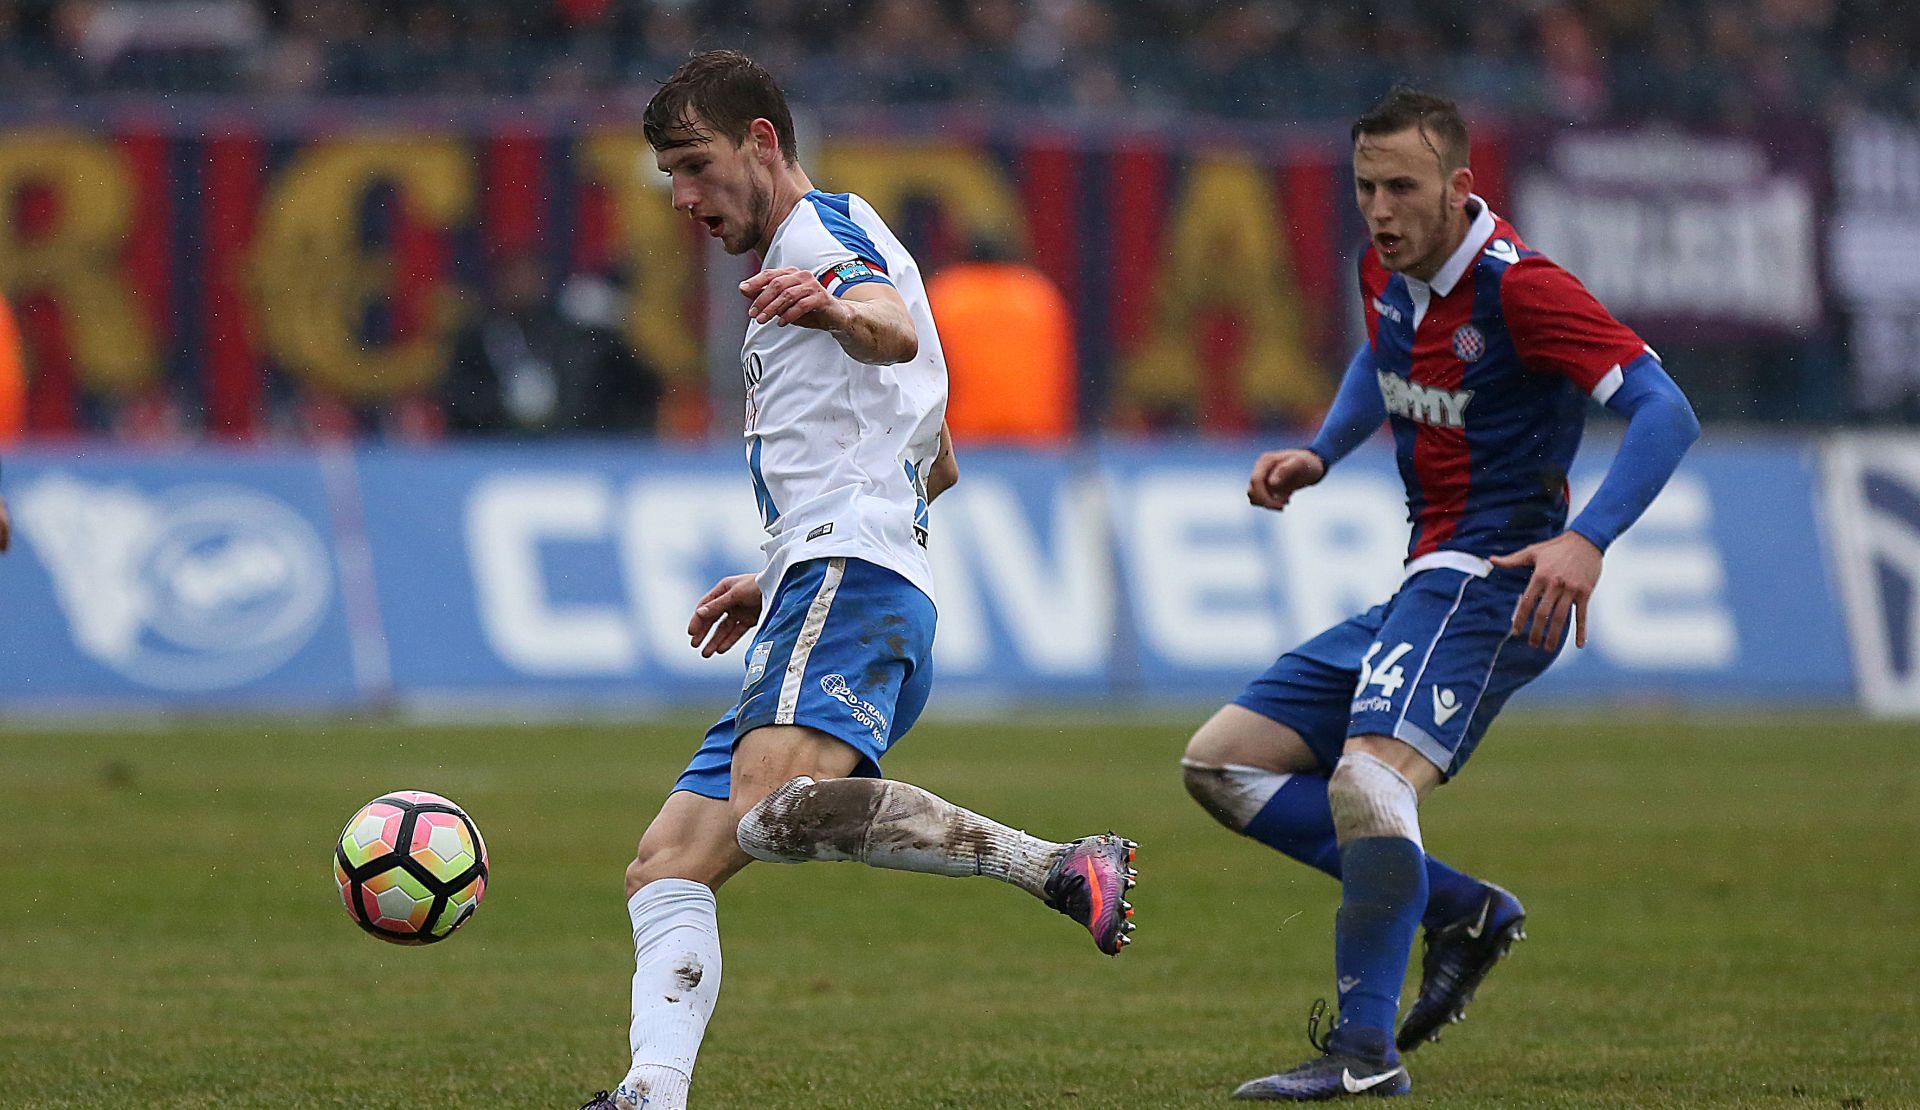 PRVA HNL Osijek – Hajduk 2-1